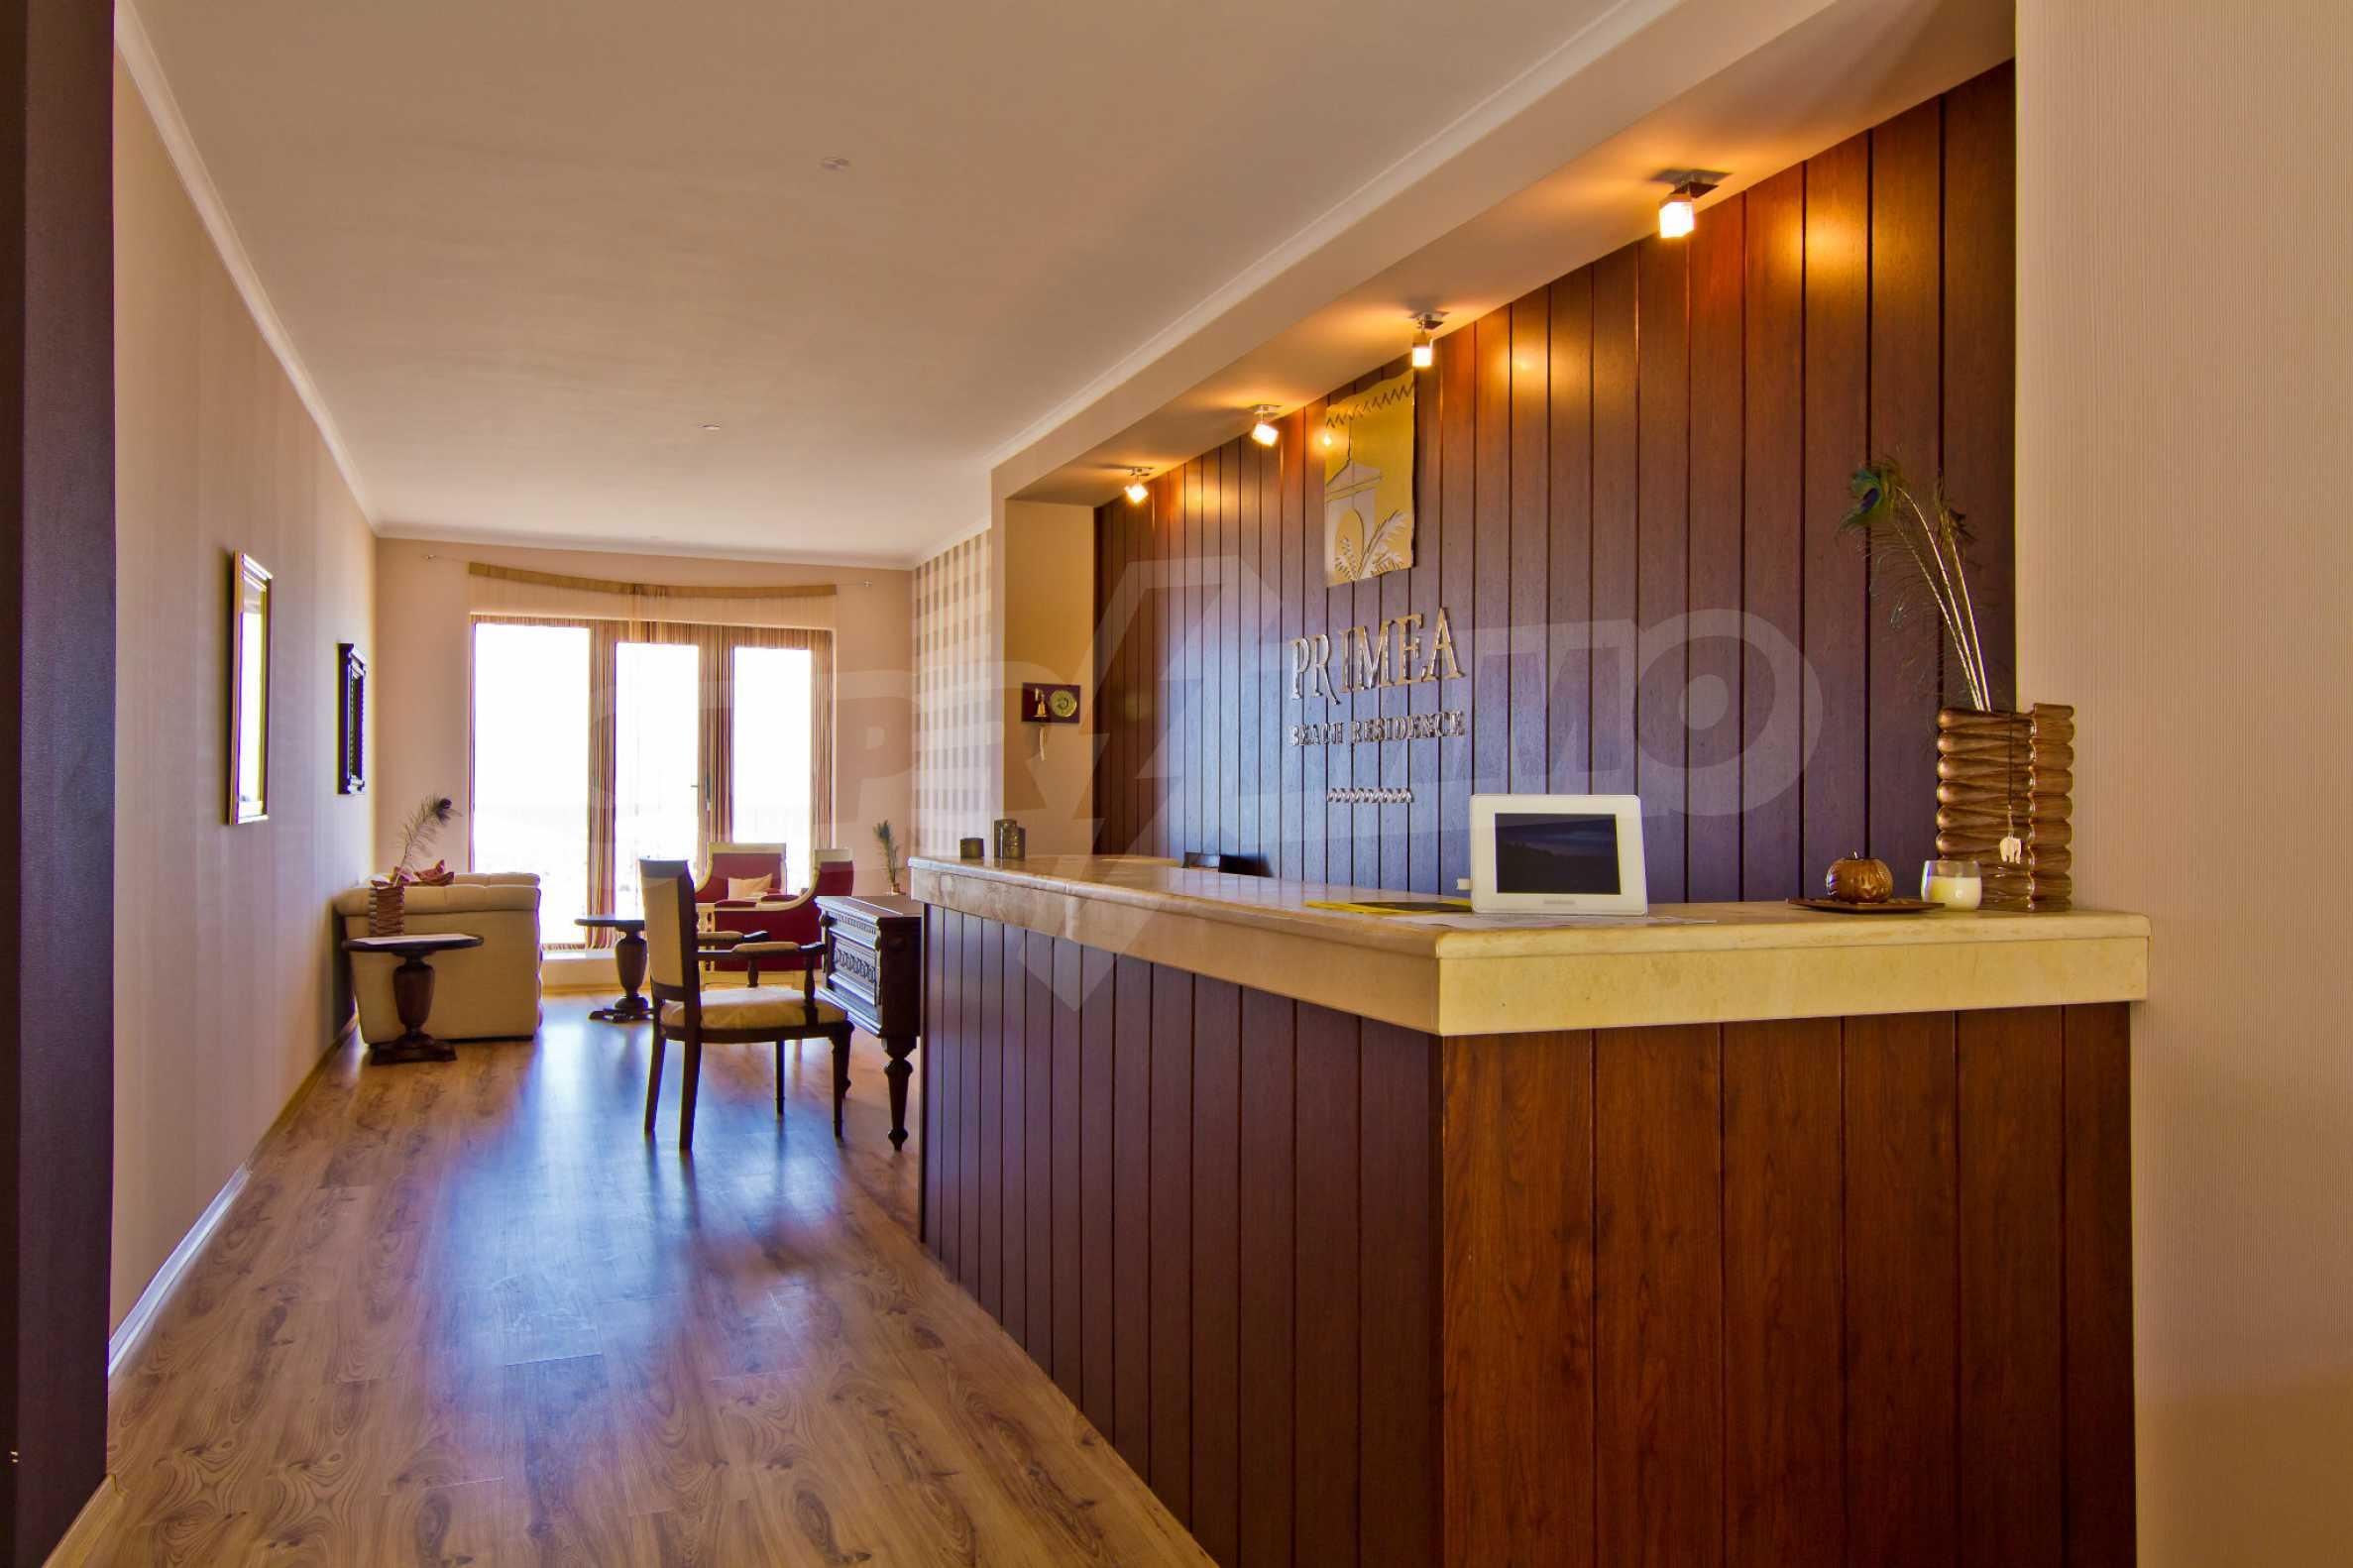 Примеа Бийч Резиденс / Primea Beach Residence 27